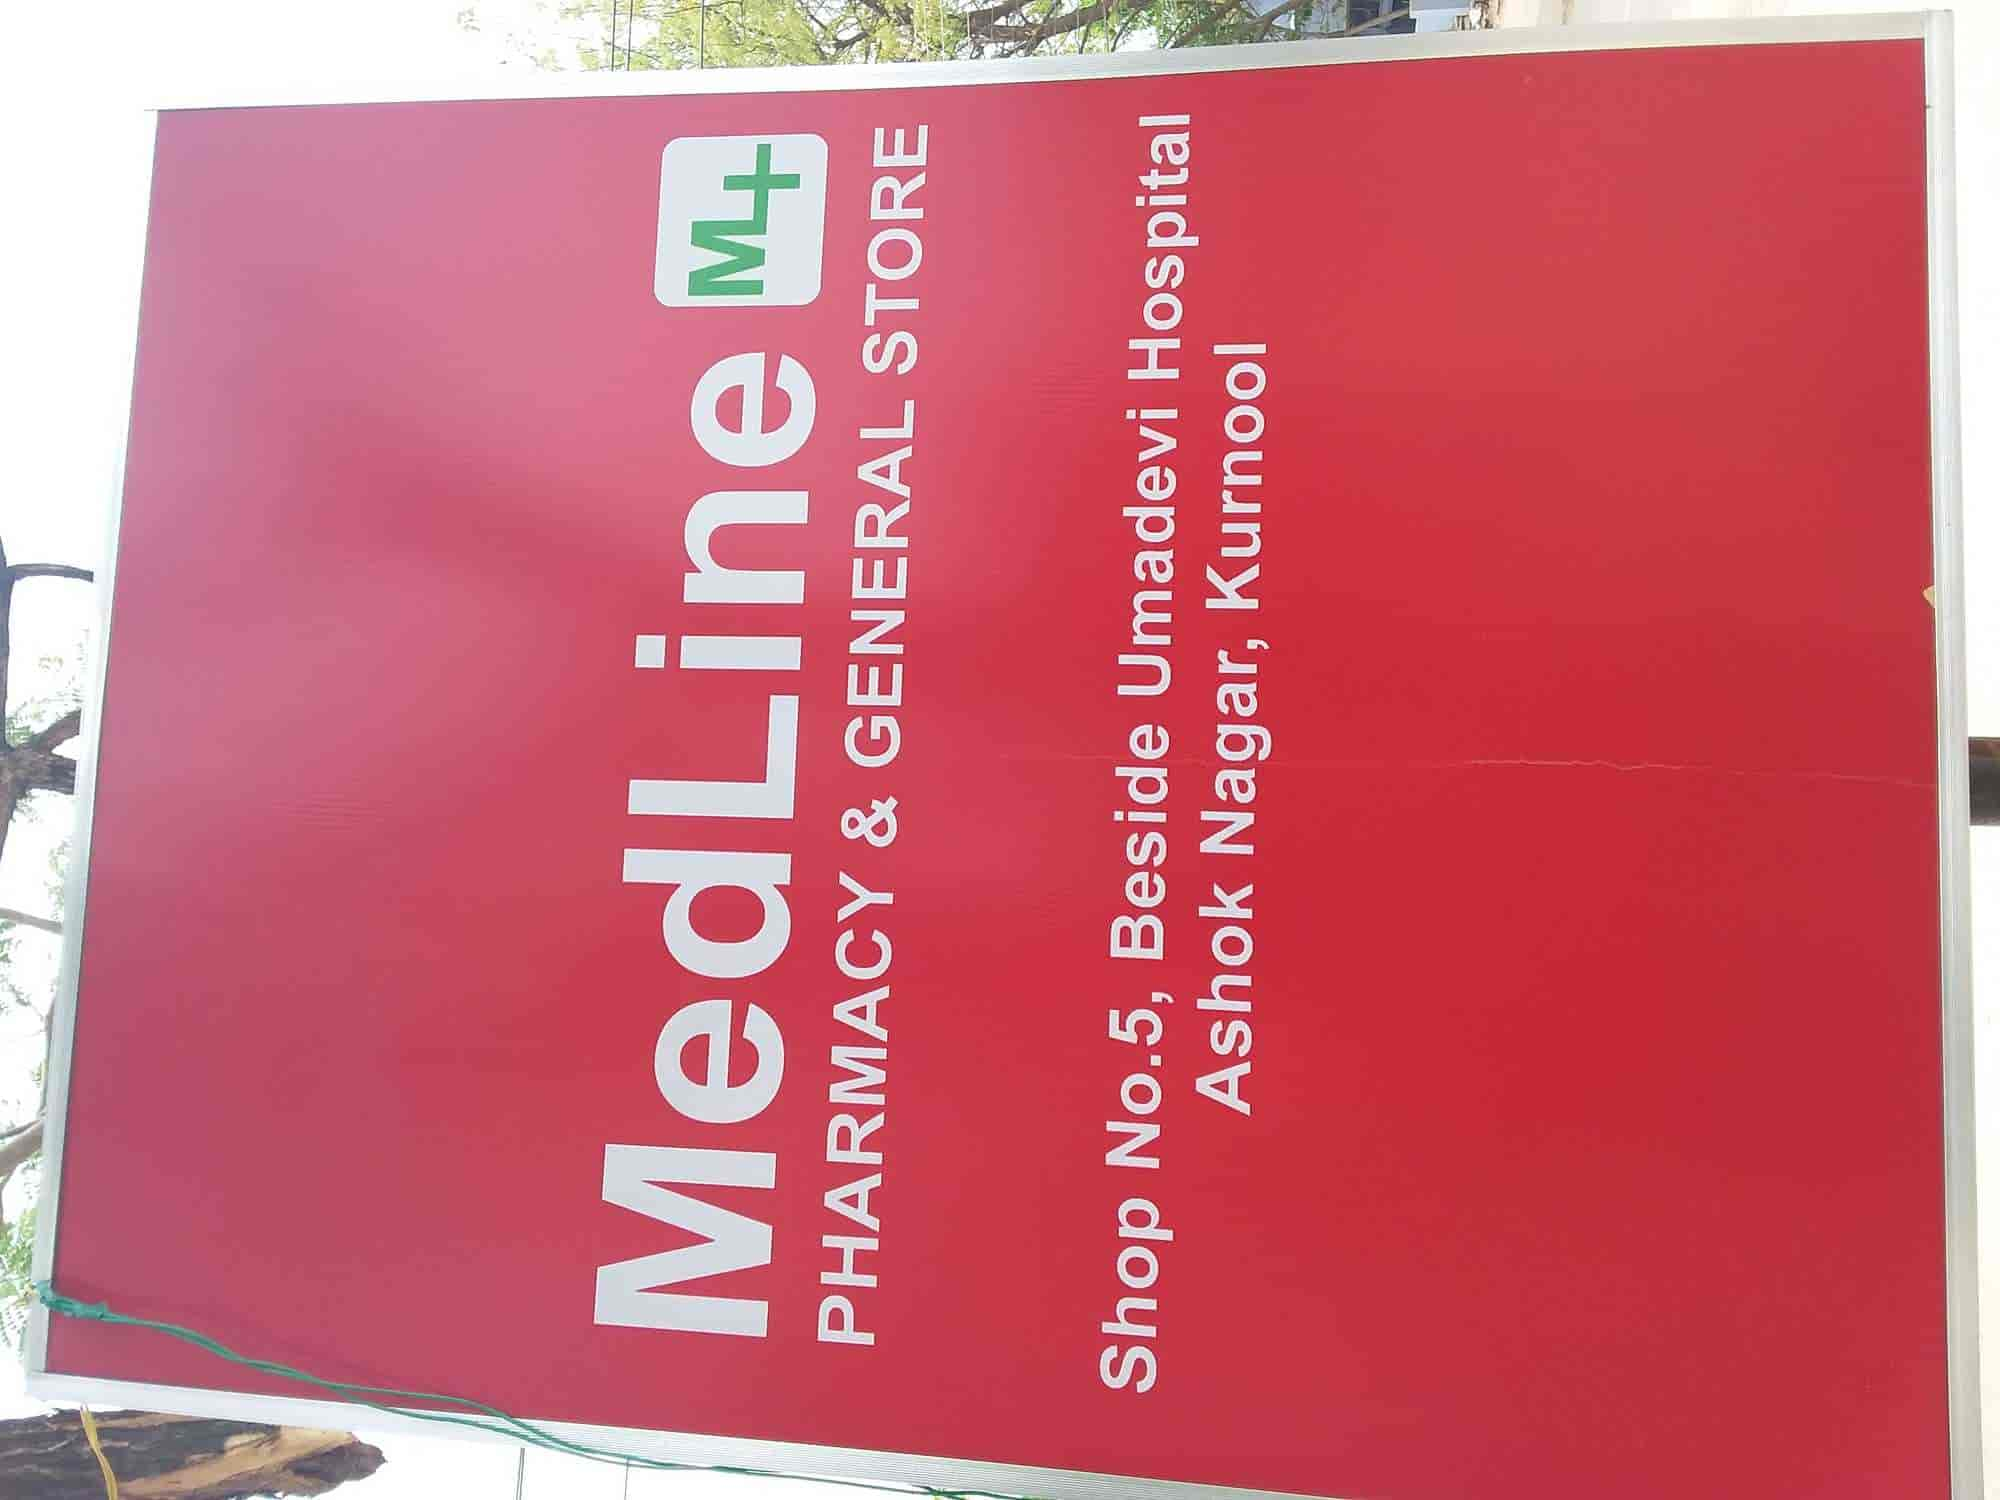 Medline Pharmacy & General Stores, Ashok Nagar - General Stores in